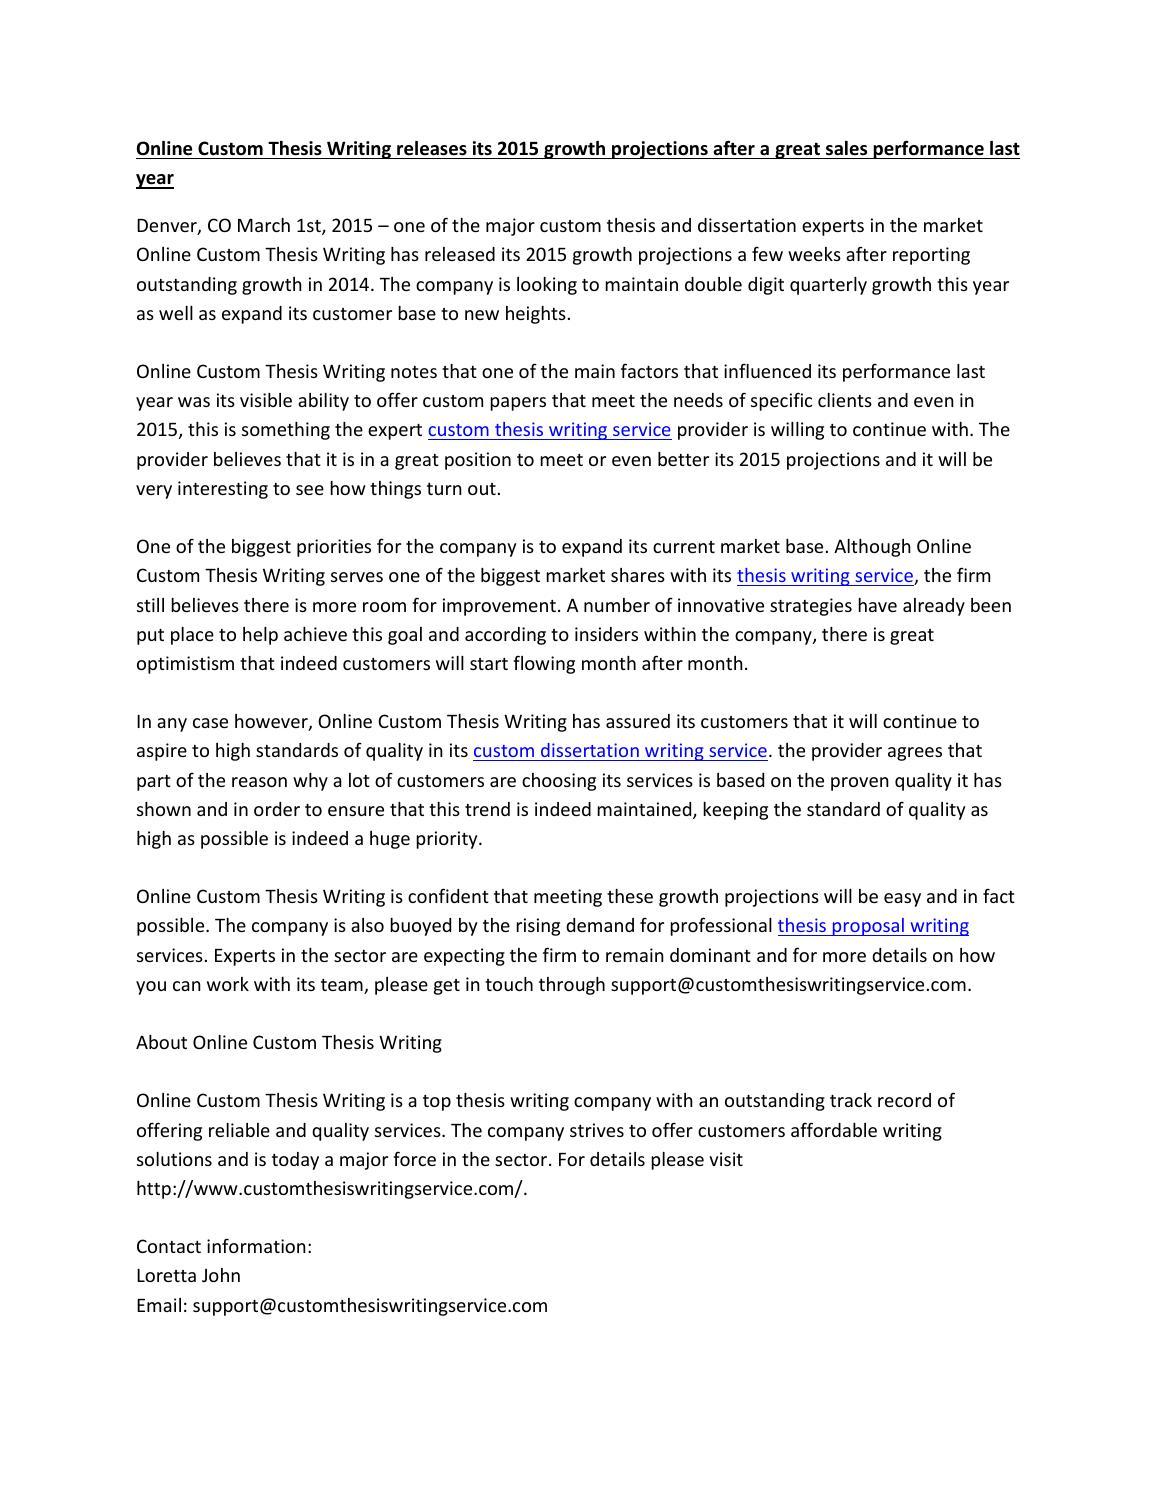 Human resources essay free